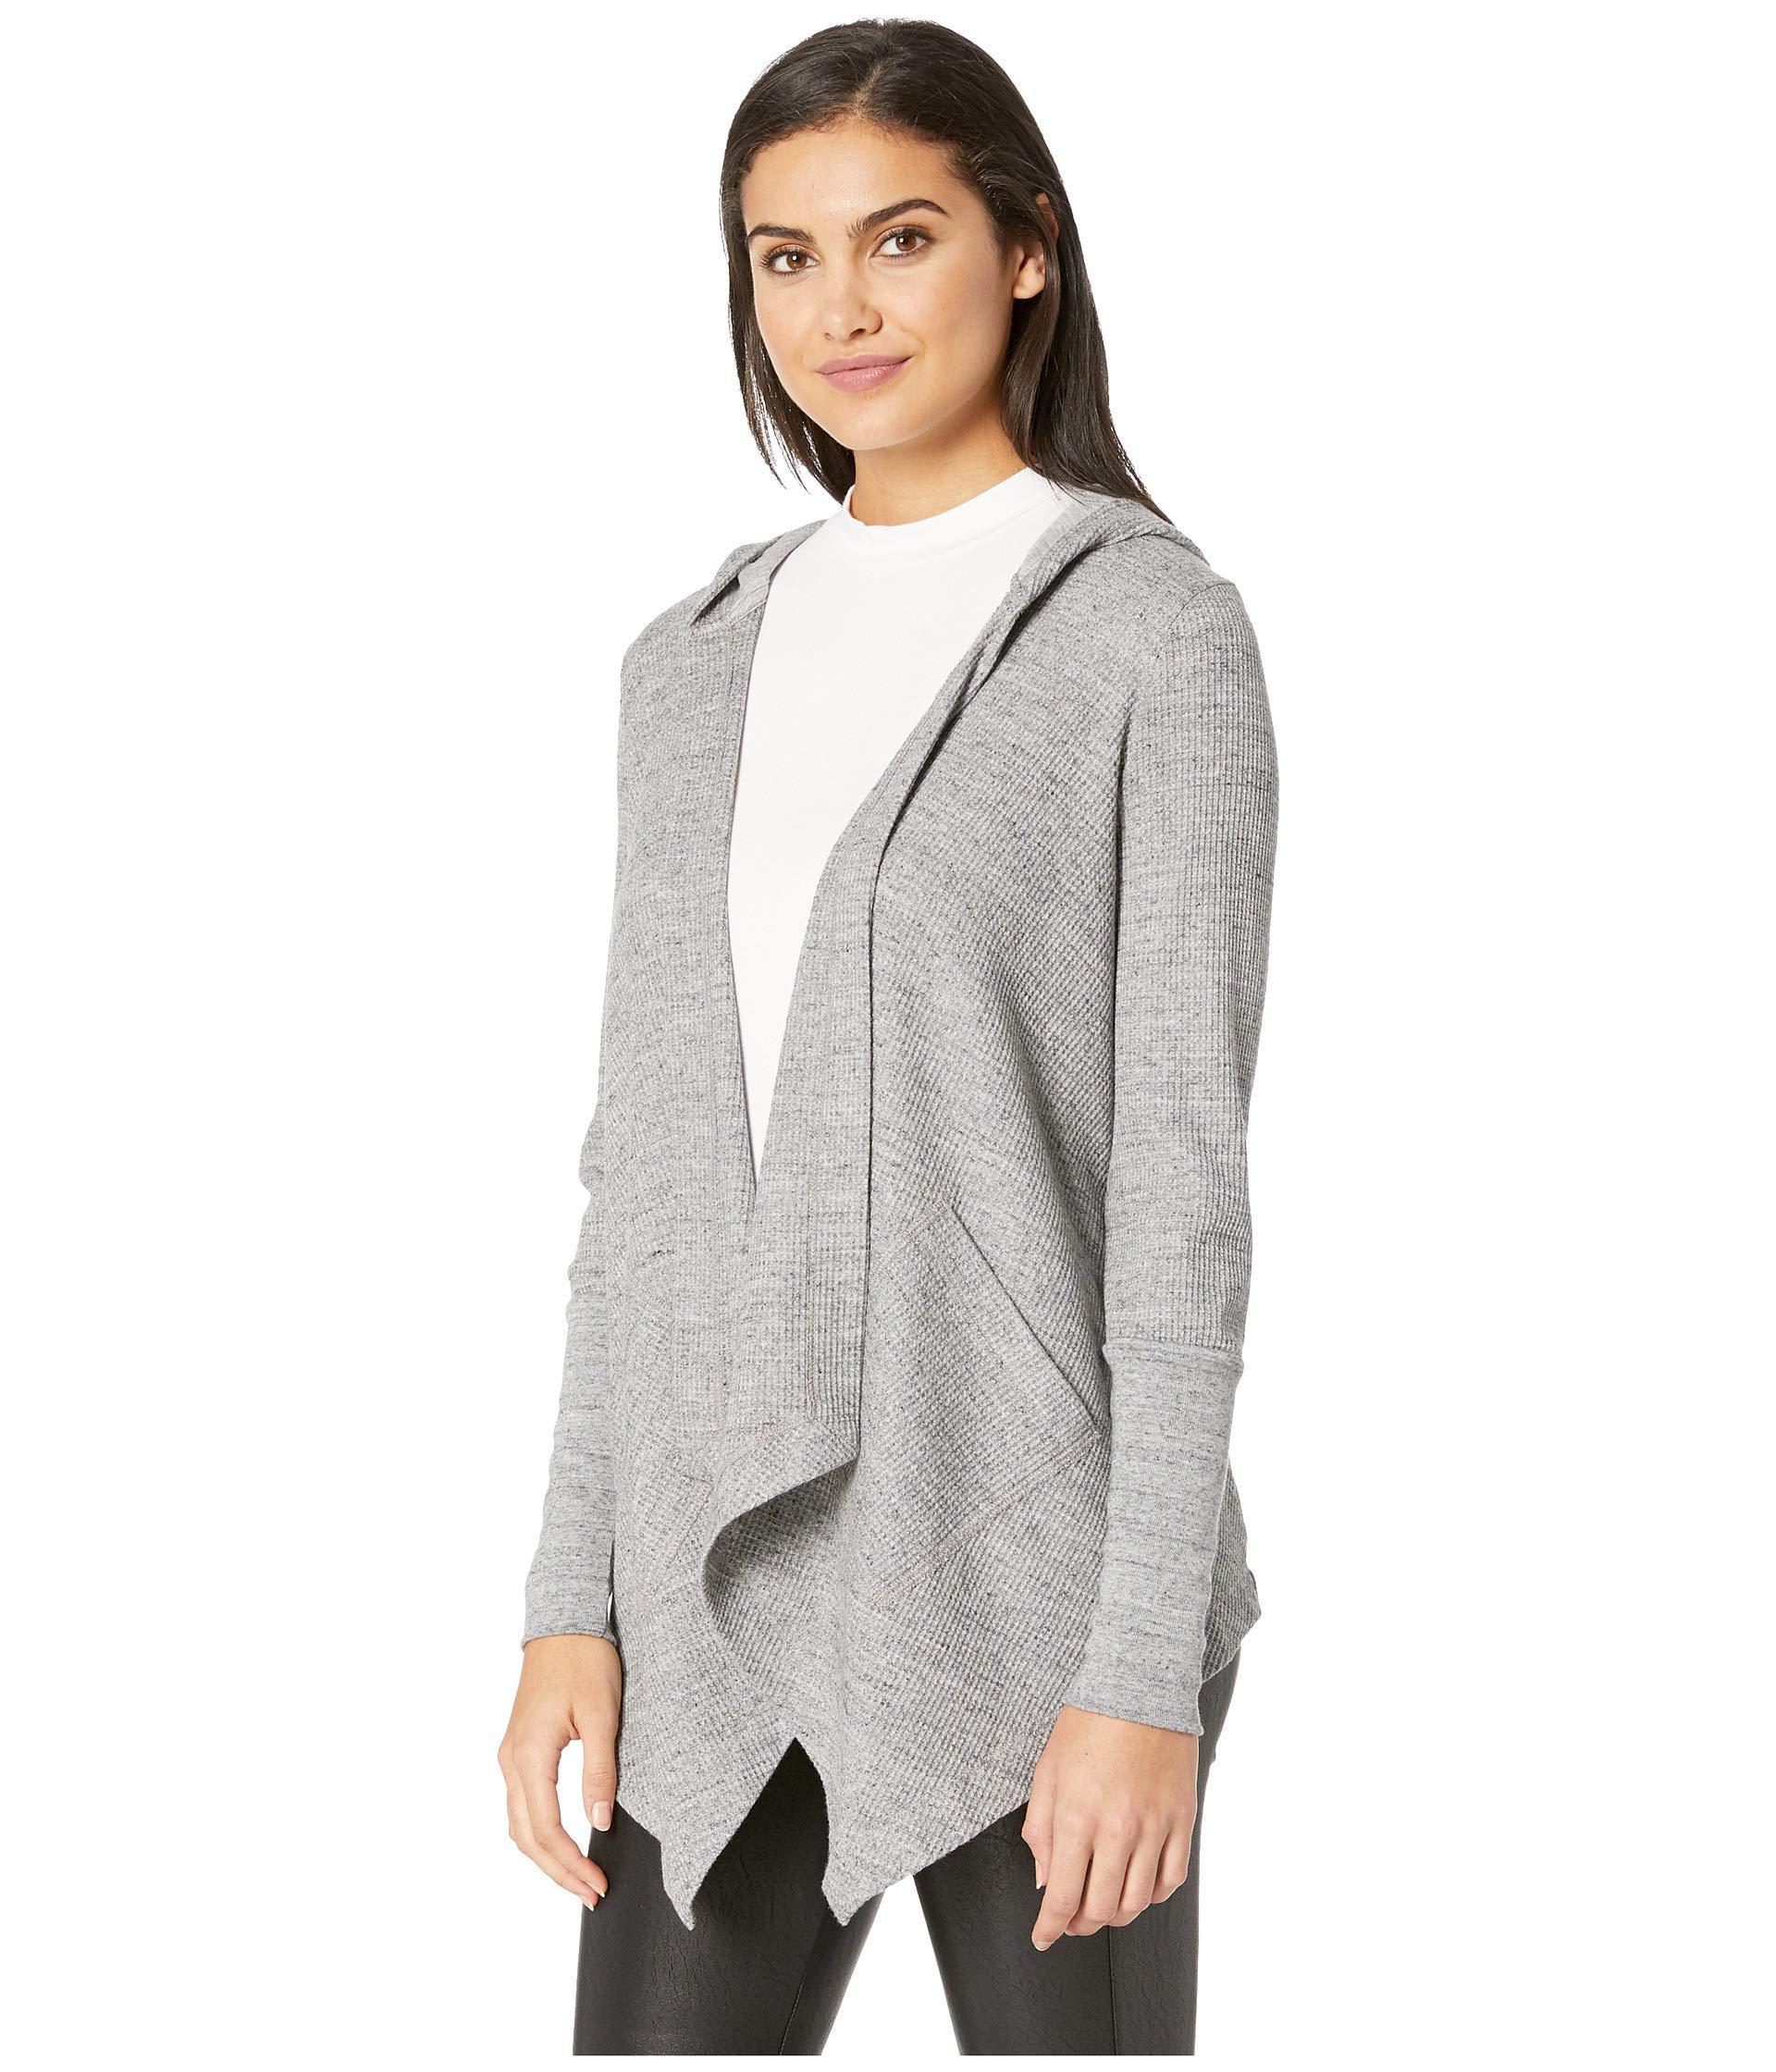 cbbb6790244374 Lyst - Splendid Thermal Flight Cardigan Hoodie (gravel Heather Grey) Women s  Sweater in Gray